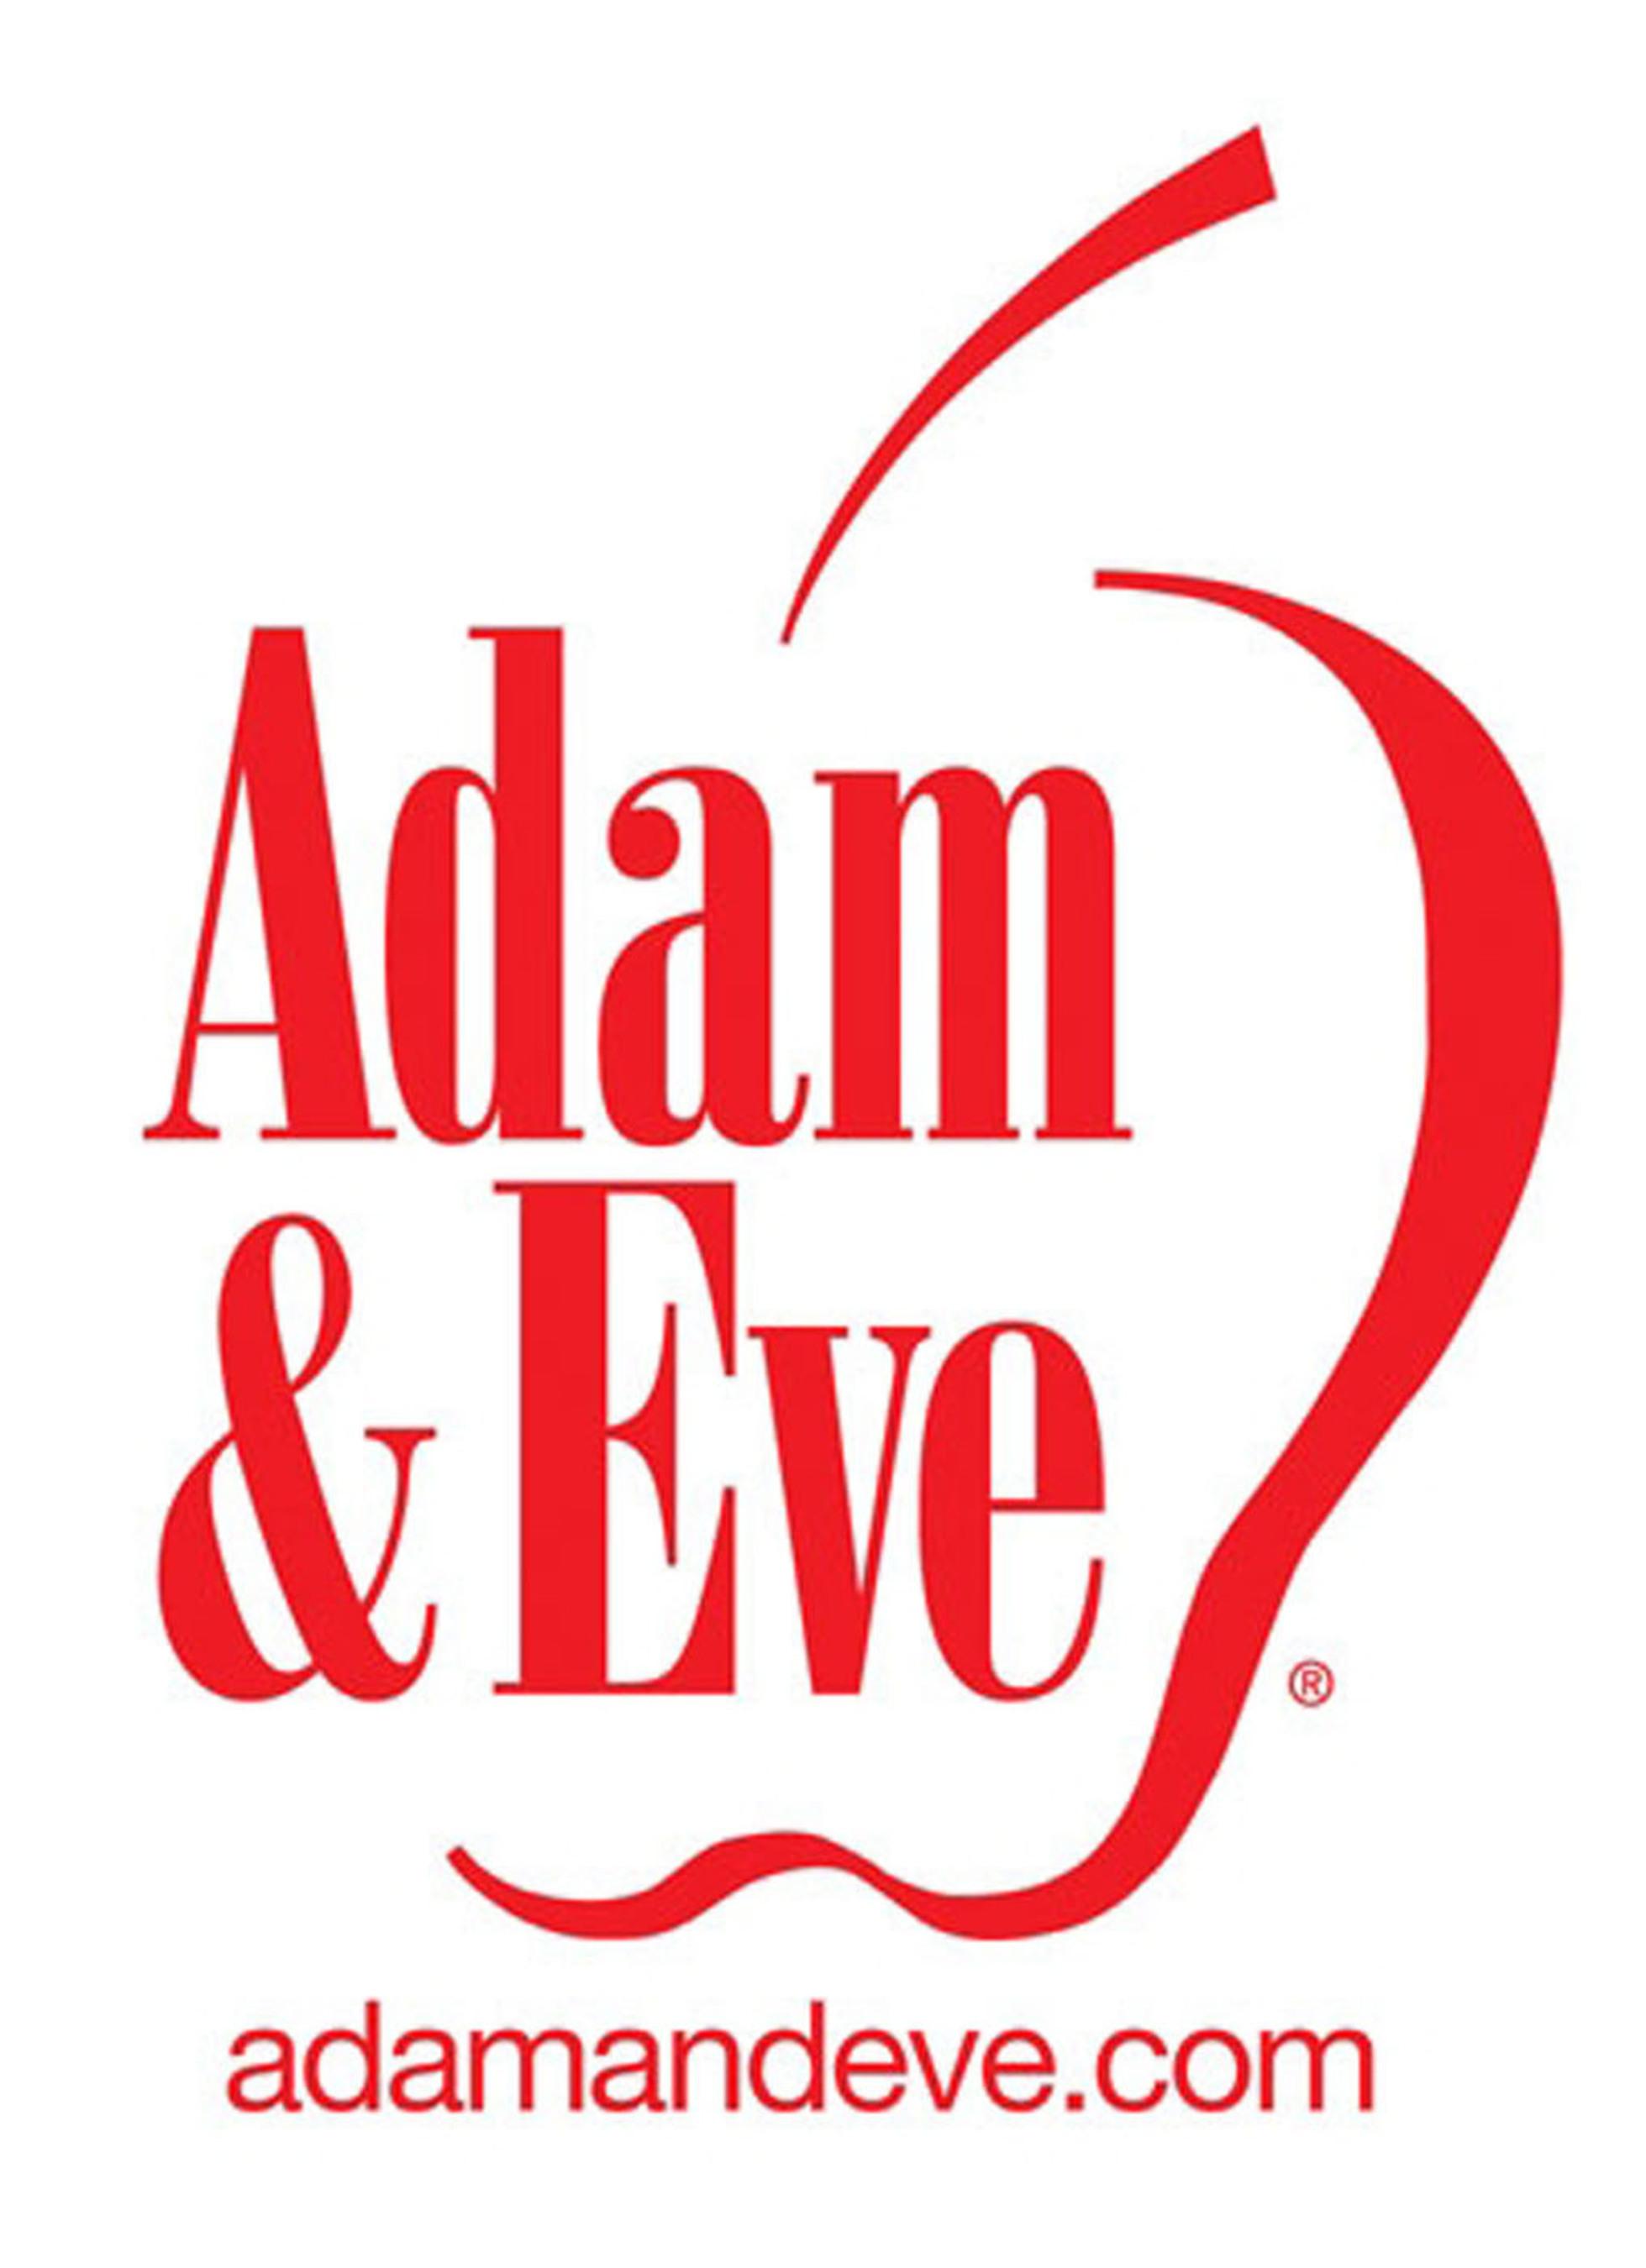 Adam & Eve LOGO.